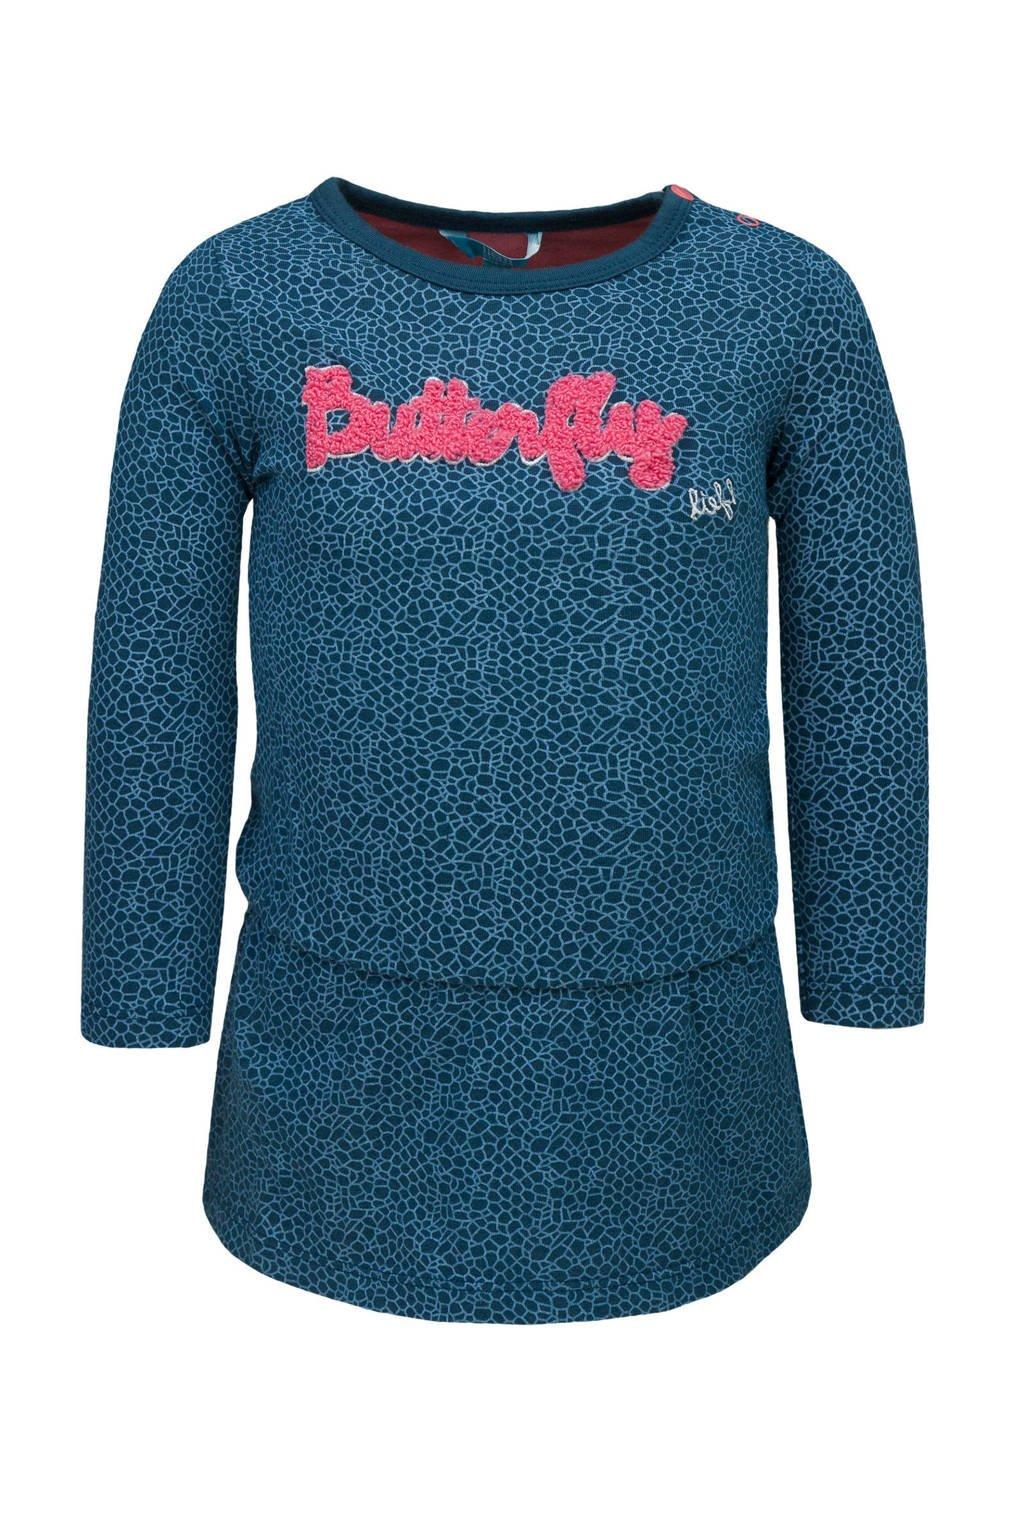 lief! jurk met tekst donkerblauw/roze, Donkerblauw/roze